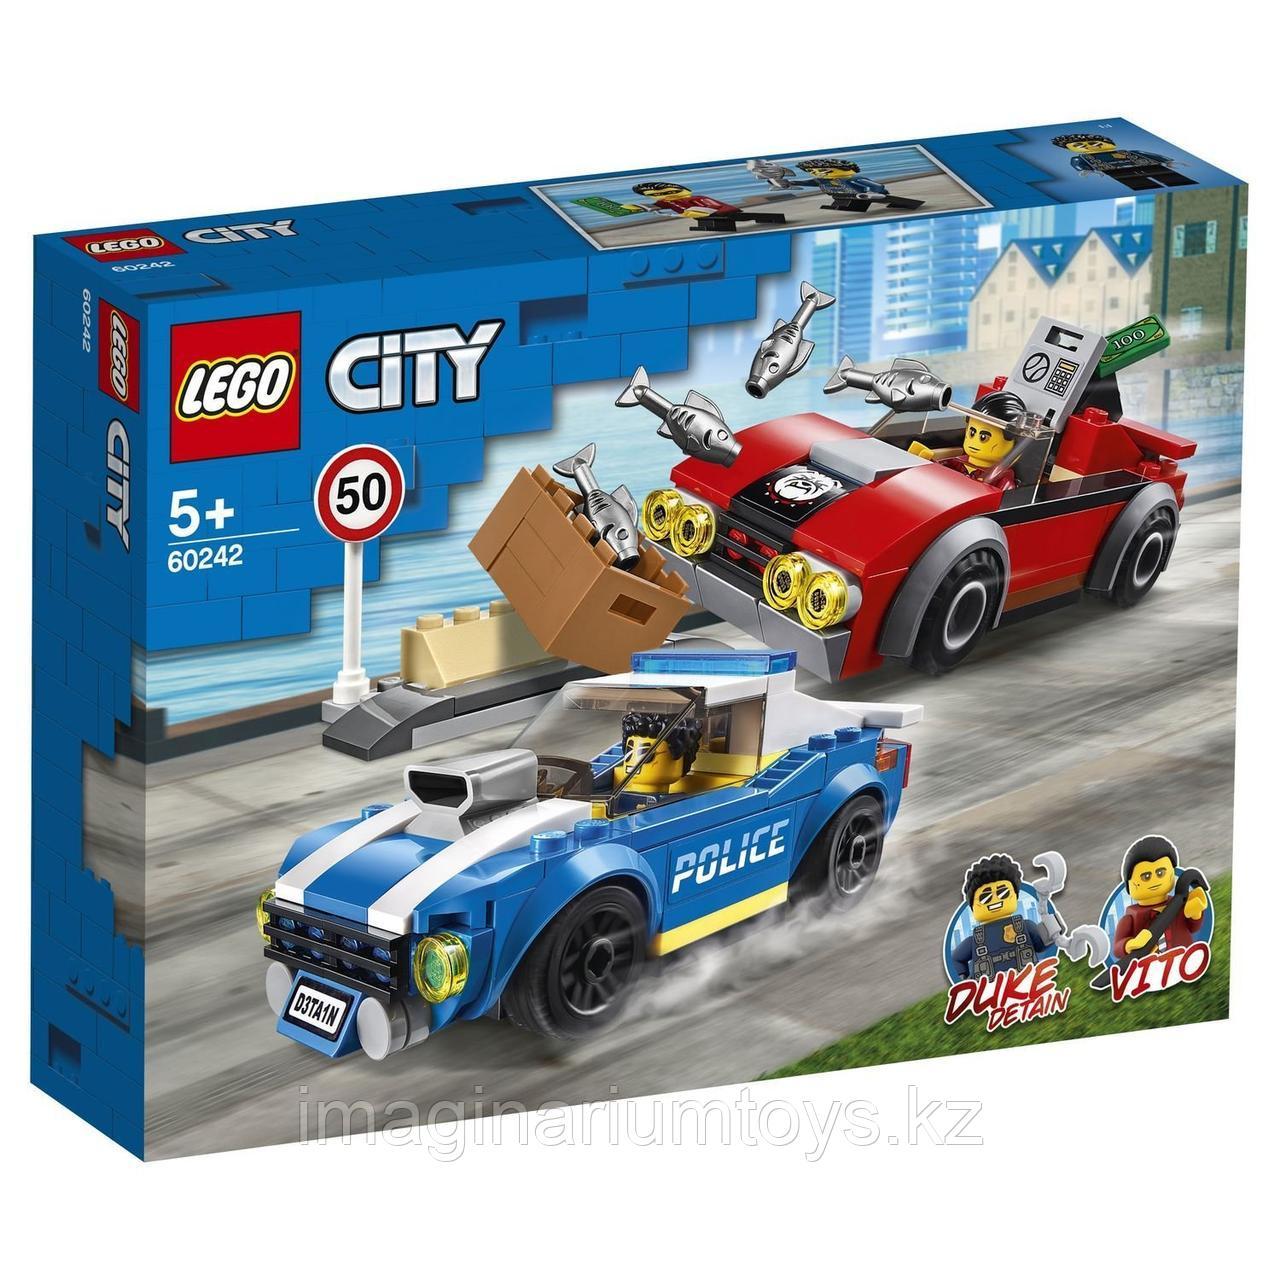 Конструктор LEGO City Лего Город Арест на шоссе 60242 - фото 4